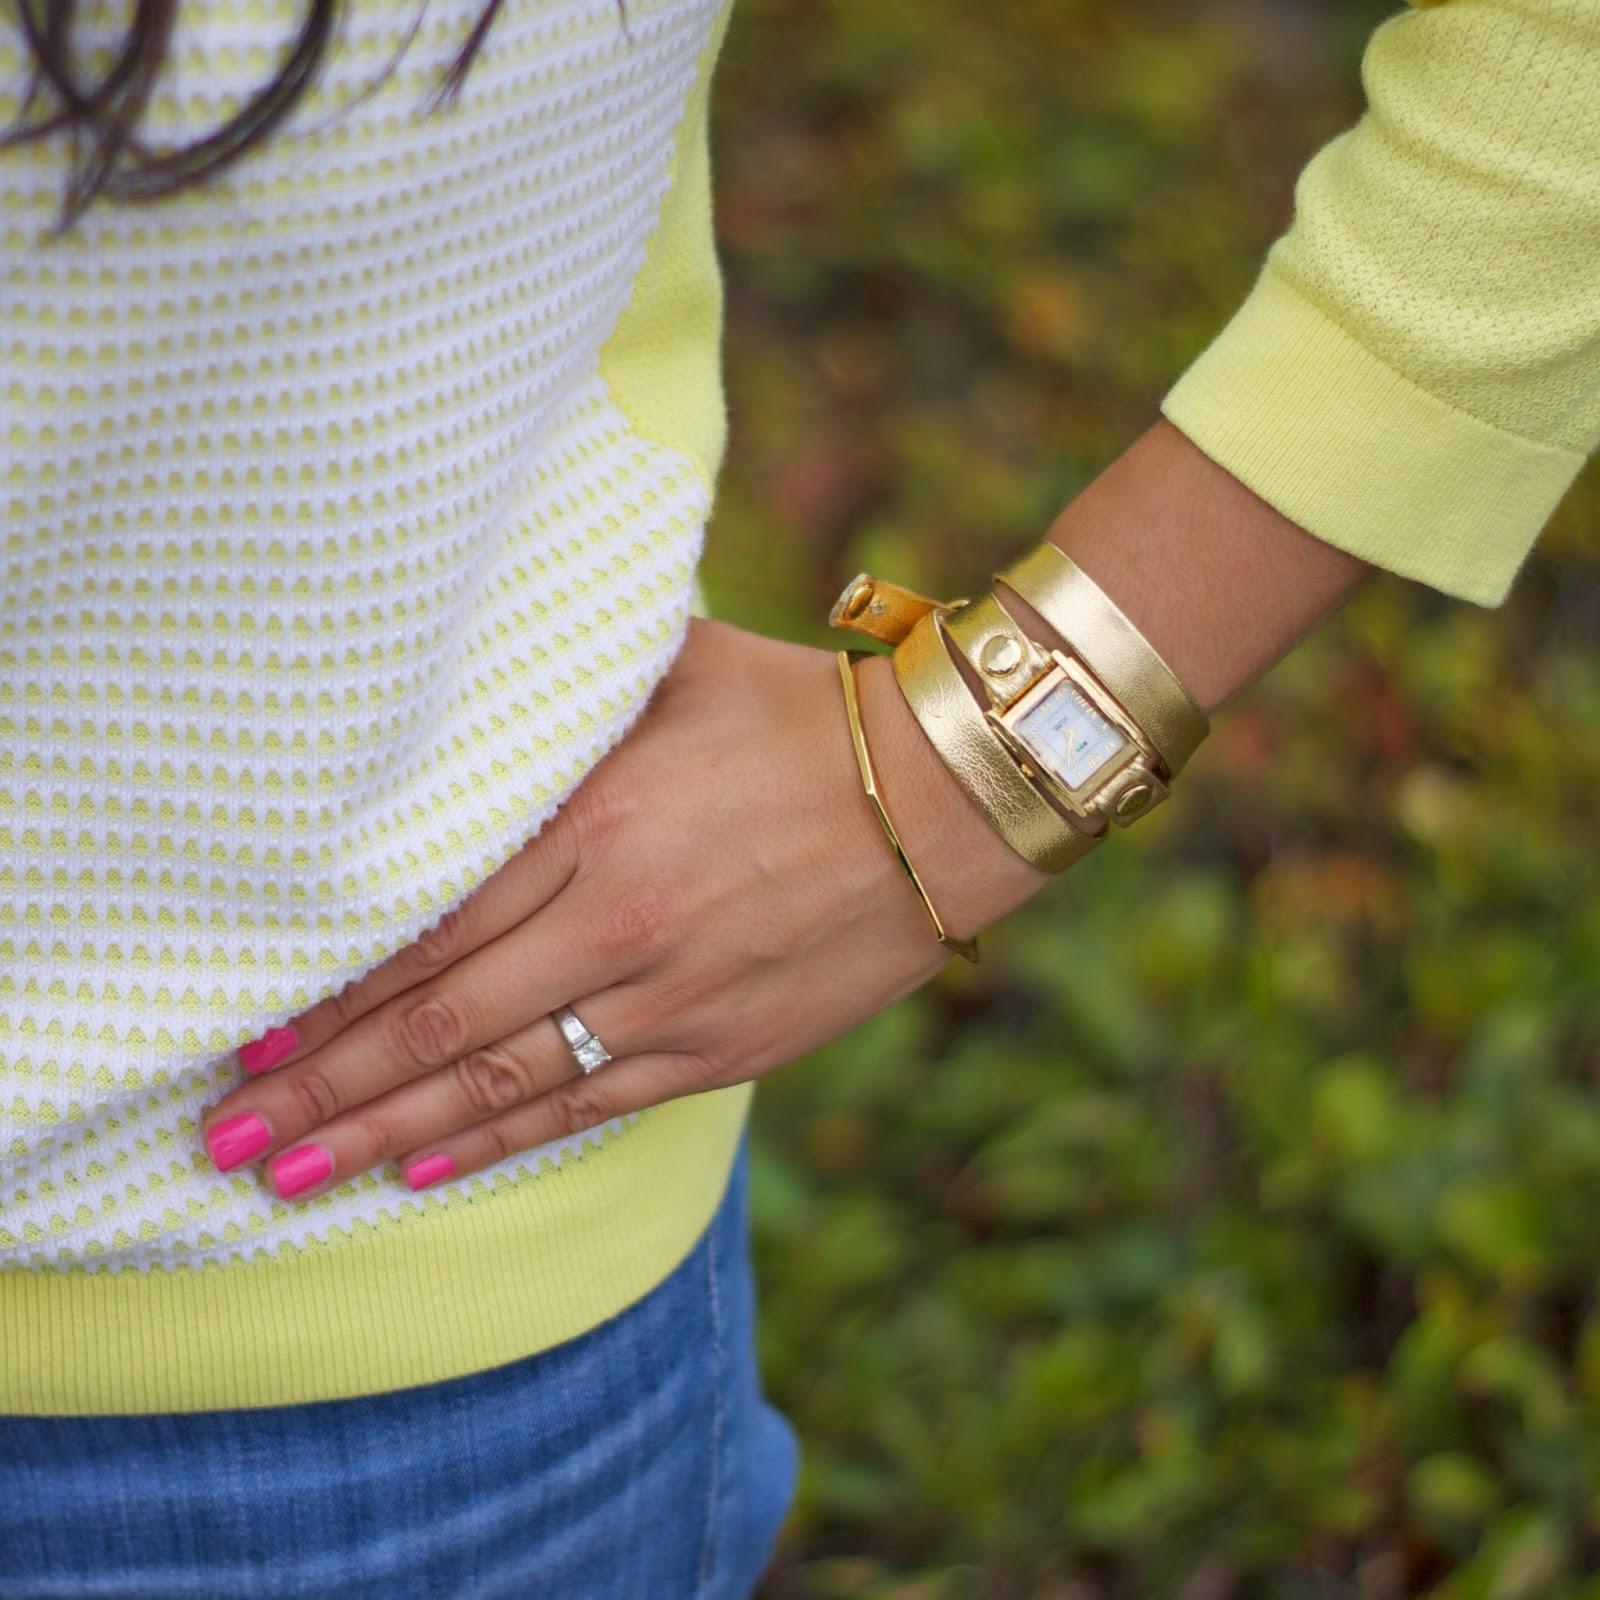 la mer gold wrap watch, gorjana bracelet happily grey collab, gorjana blogger